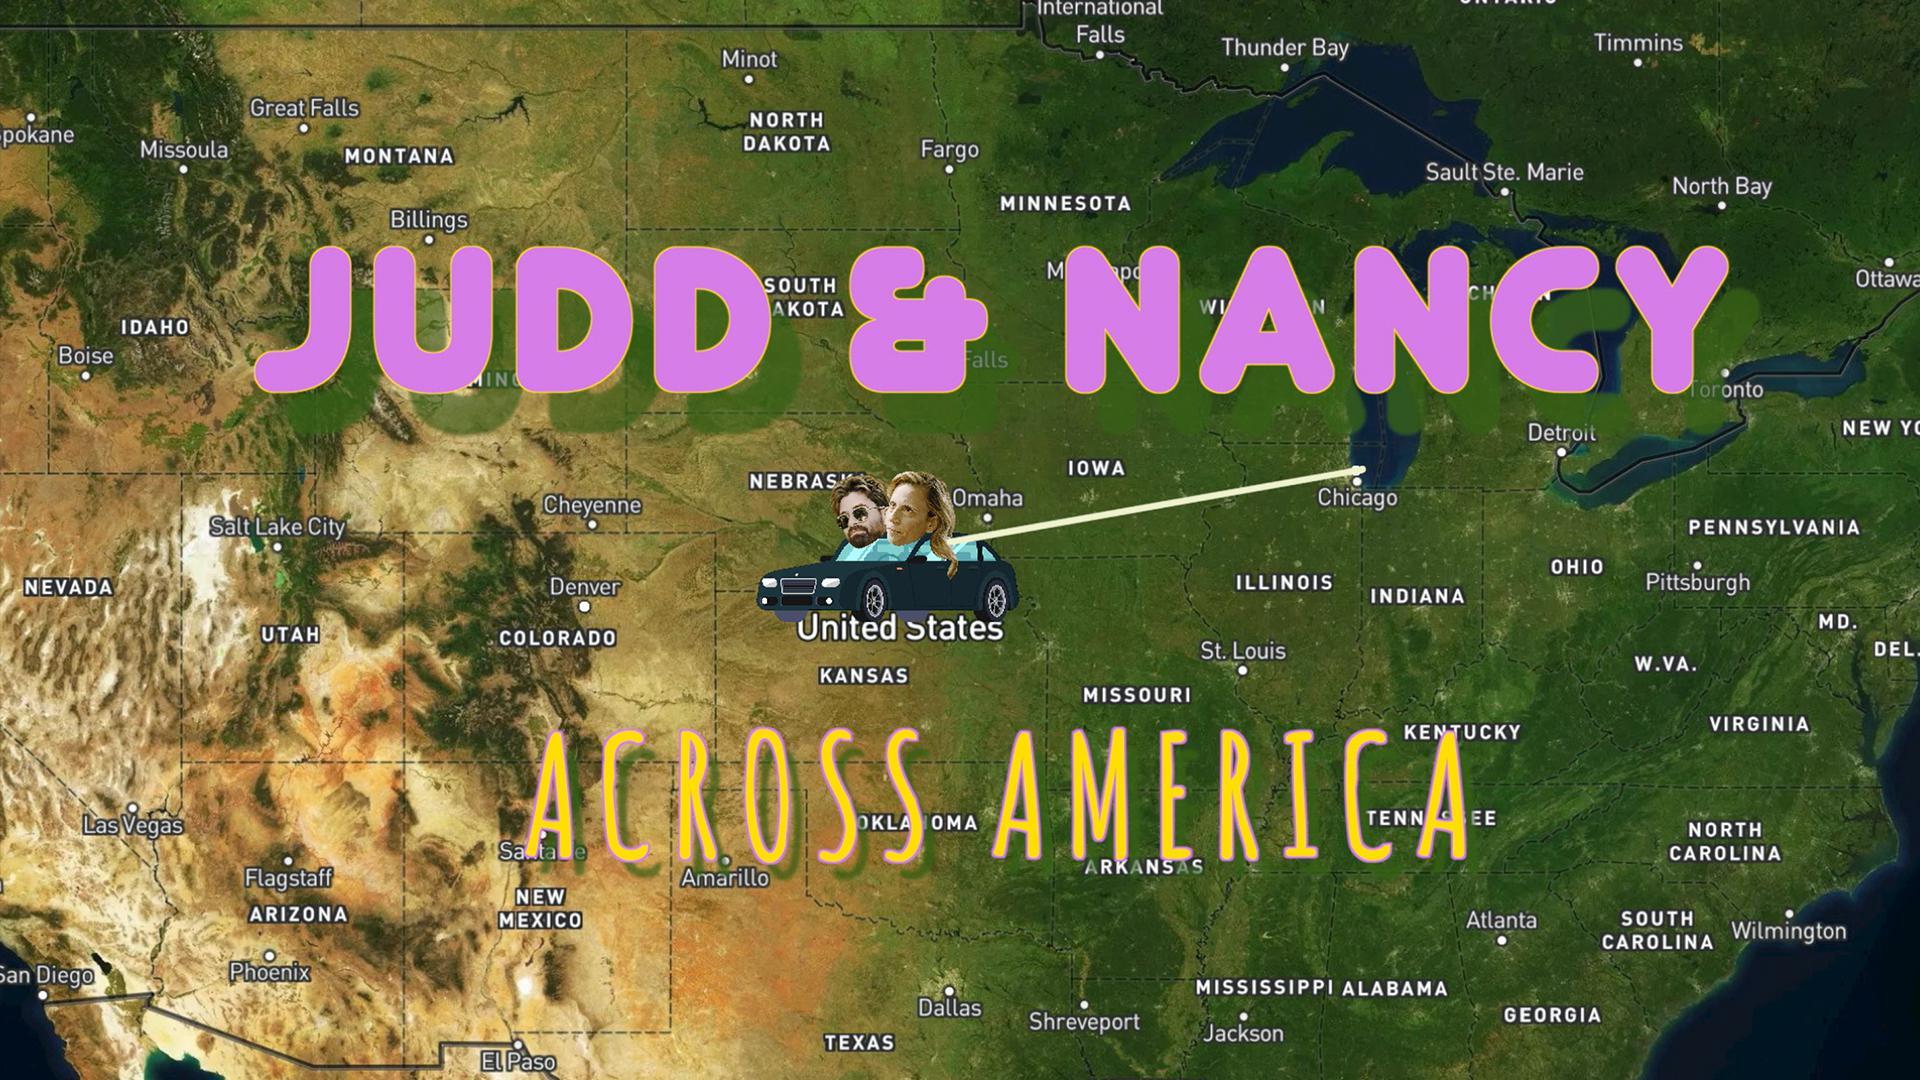 Judd and Nancy Across America